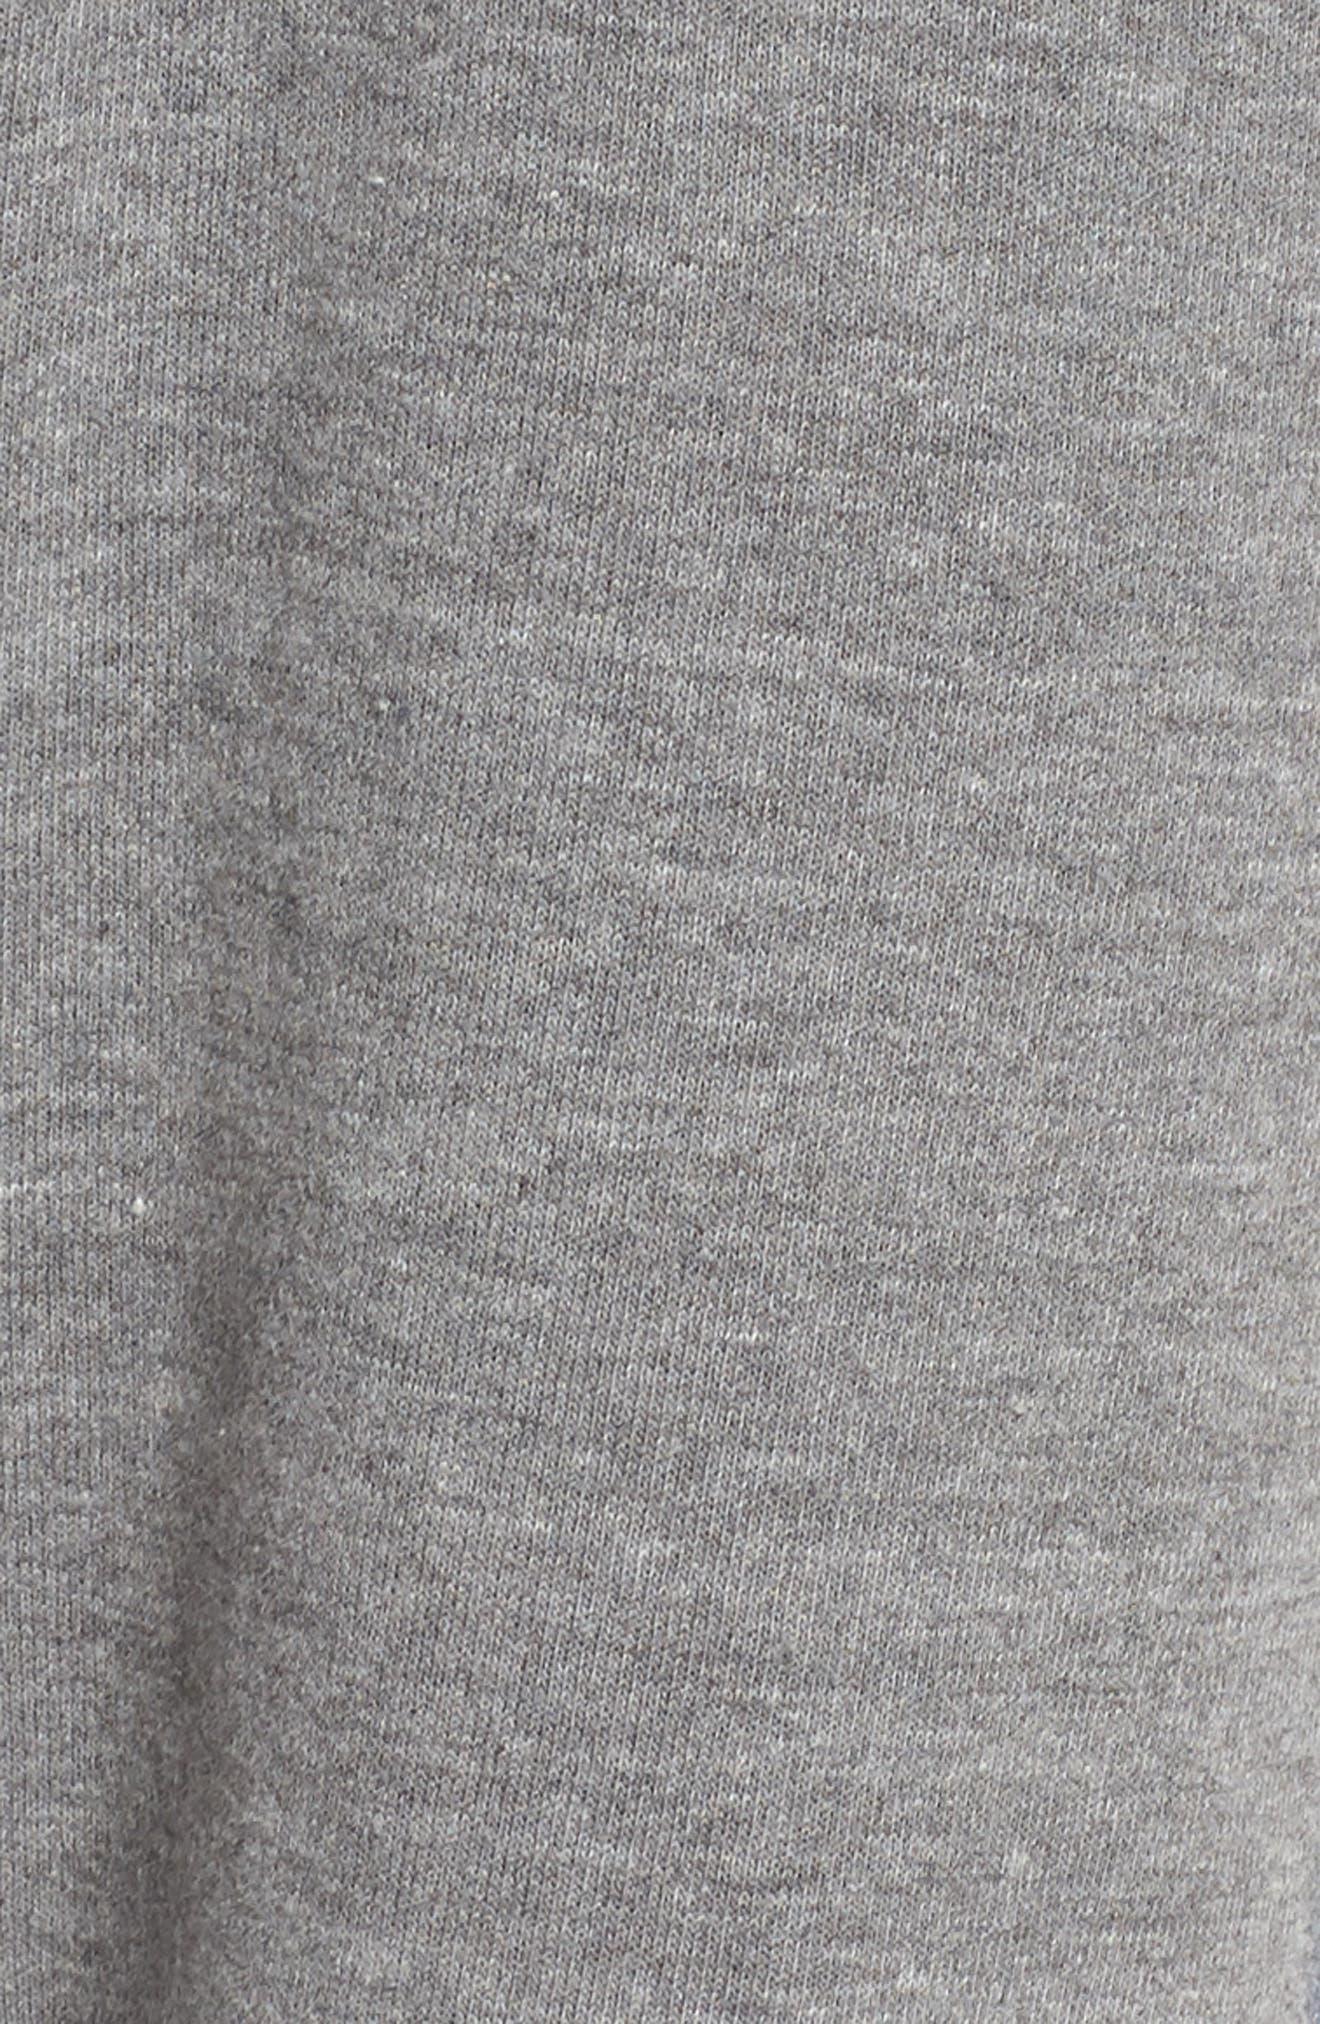 Stripe Sweatpants,                             Alternate thumbnail 6, color,                             Heather Grey/ Blue Stripes